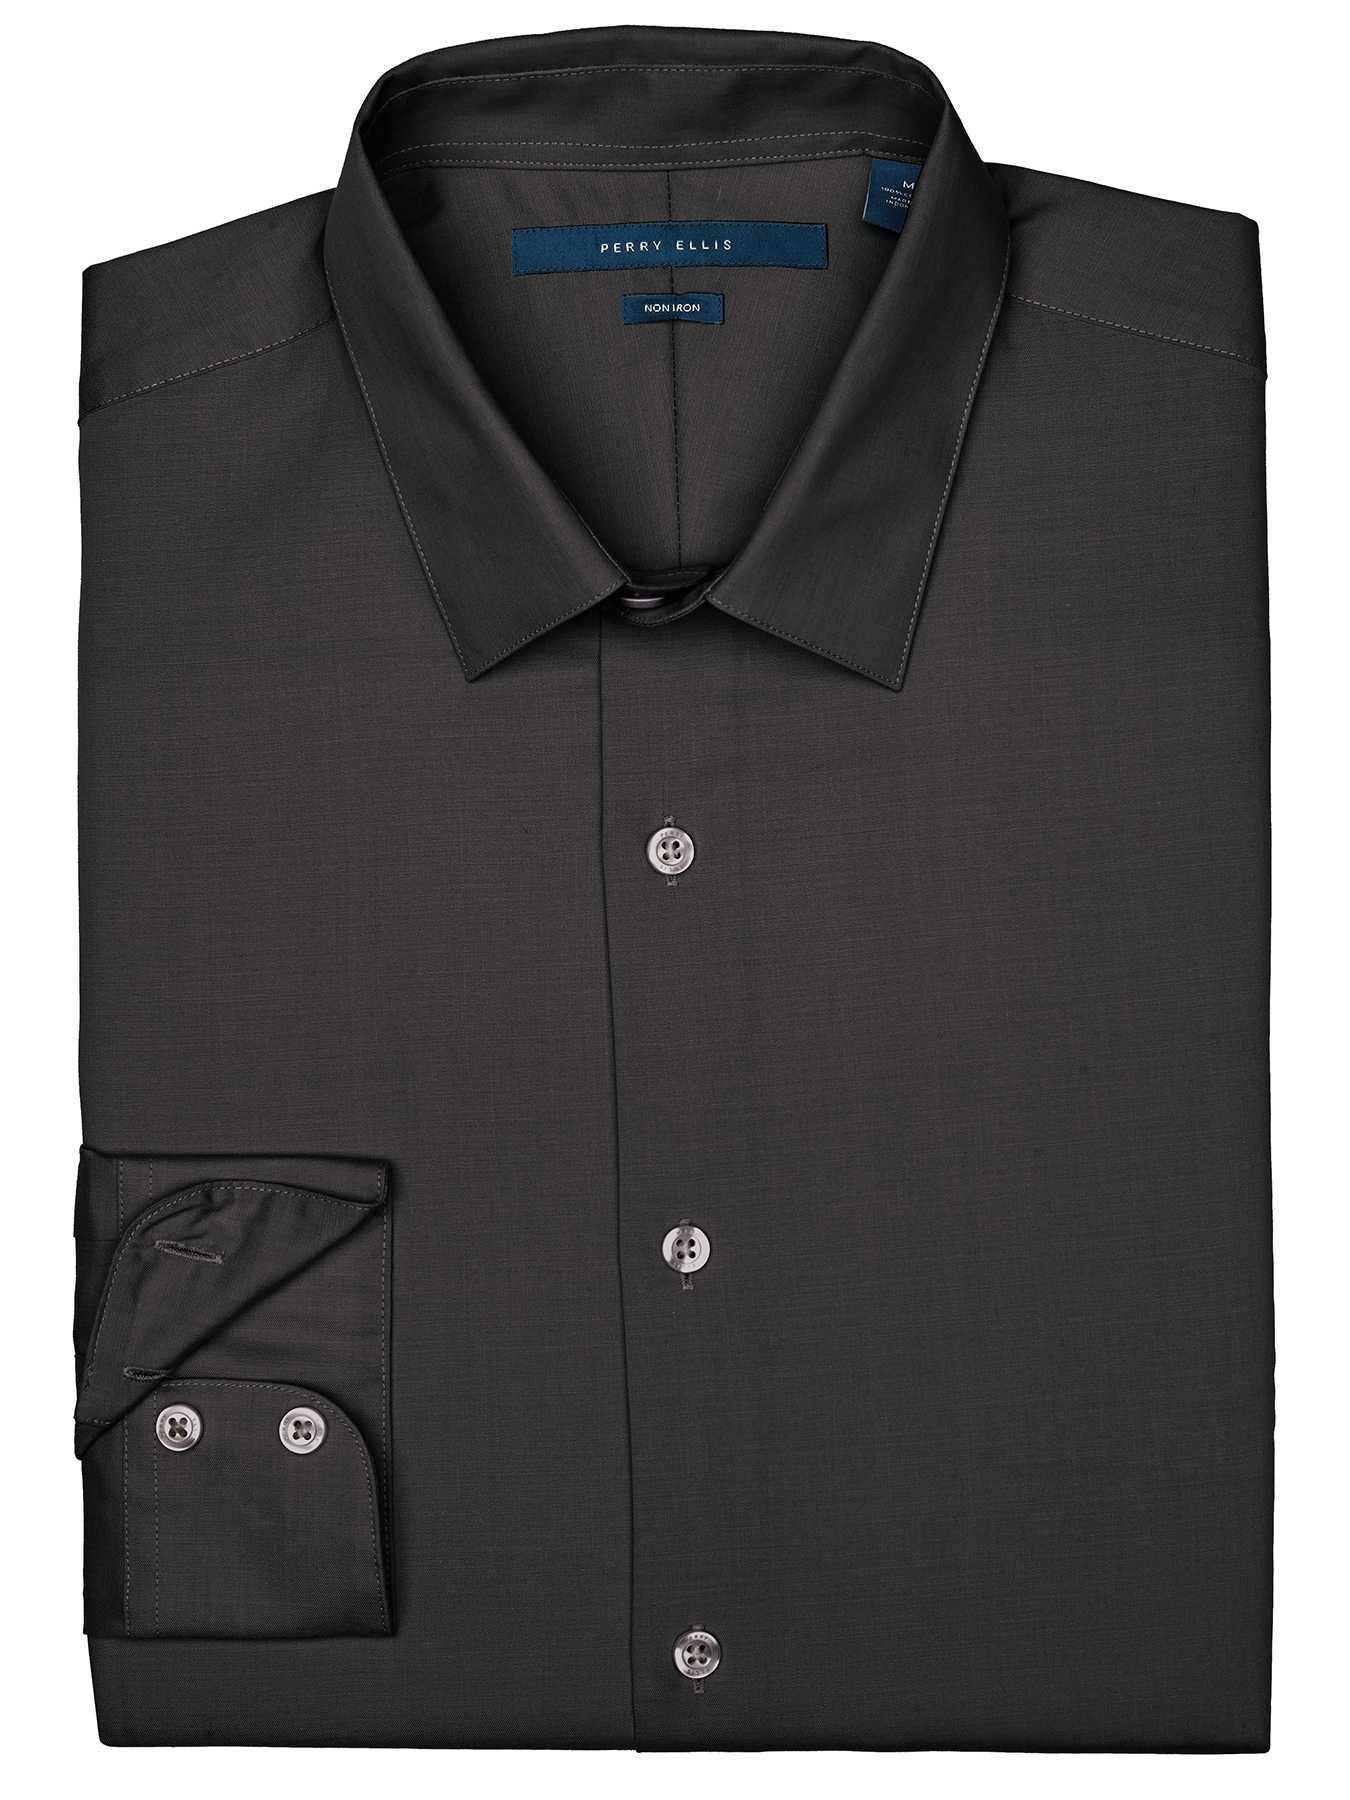 Perry Ellis Non-Iron Essential Shirt